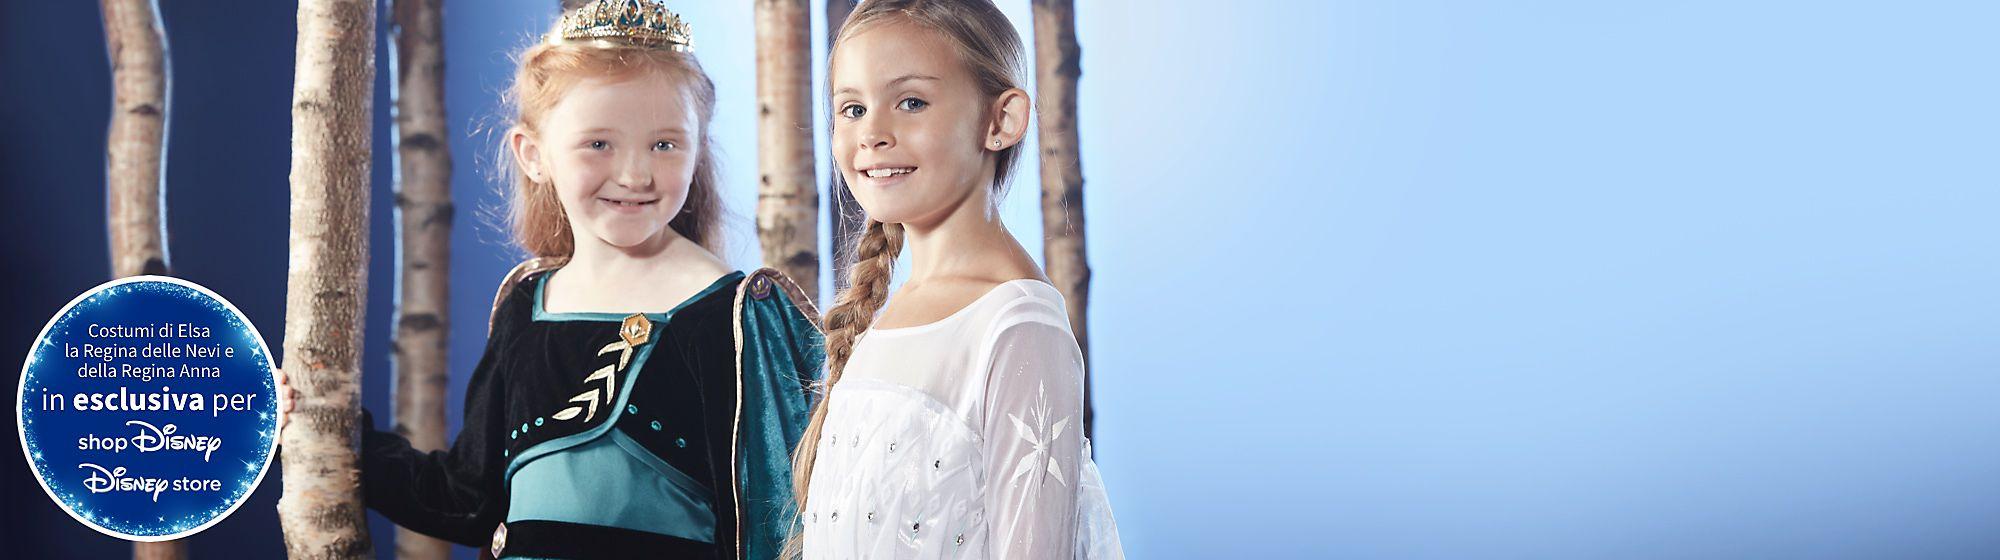 Costumi di Frozen 2 Scopri i nostri costumi magici di Arendelle